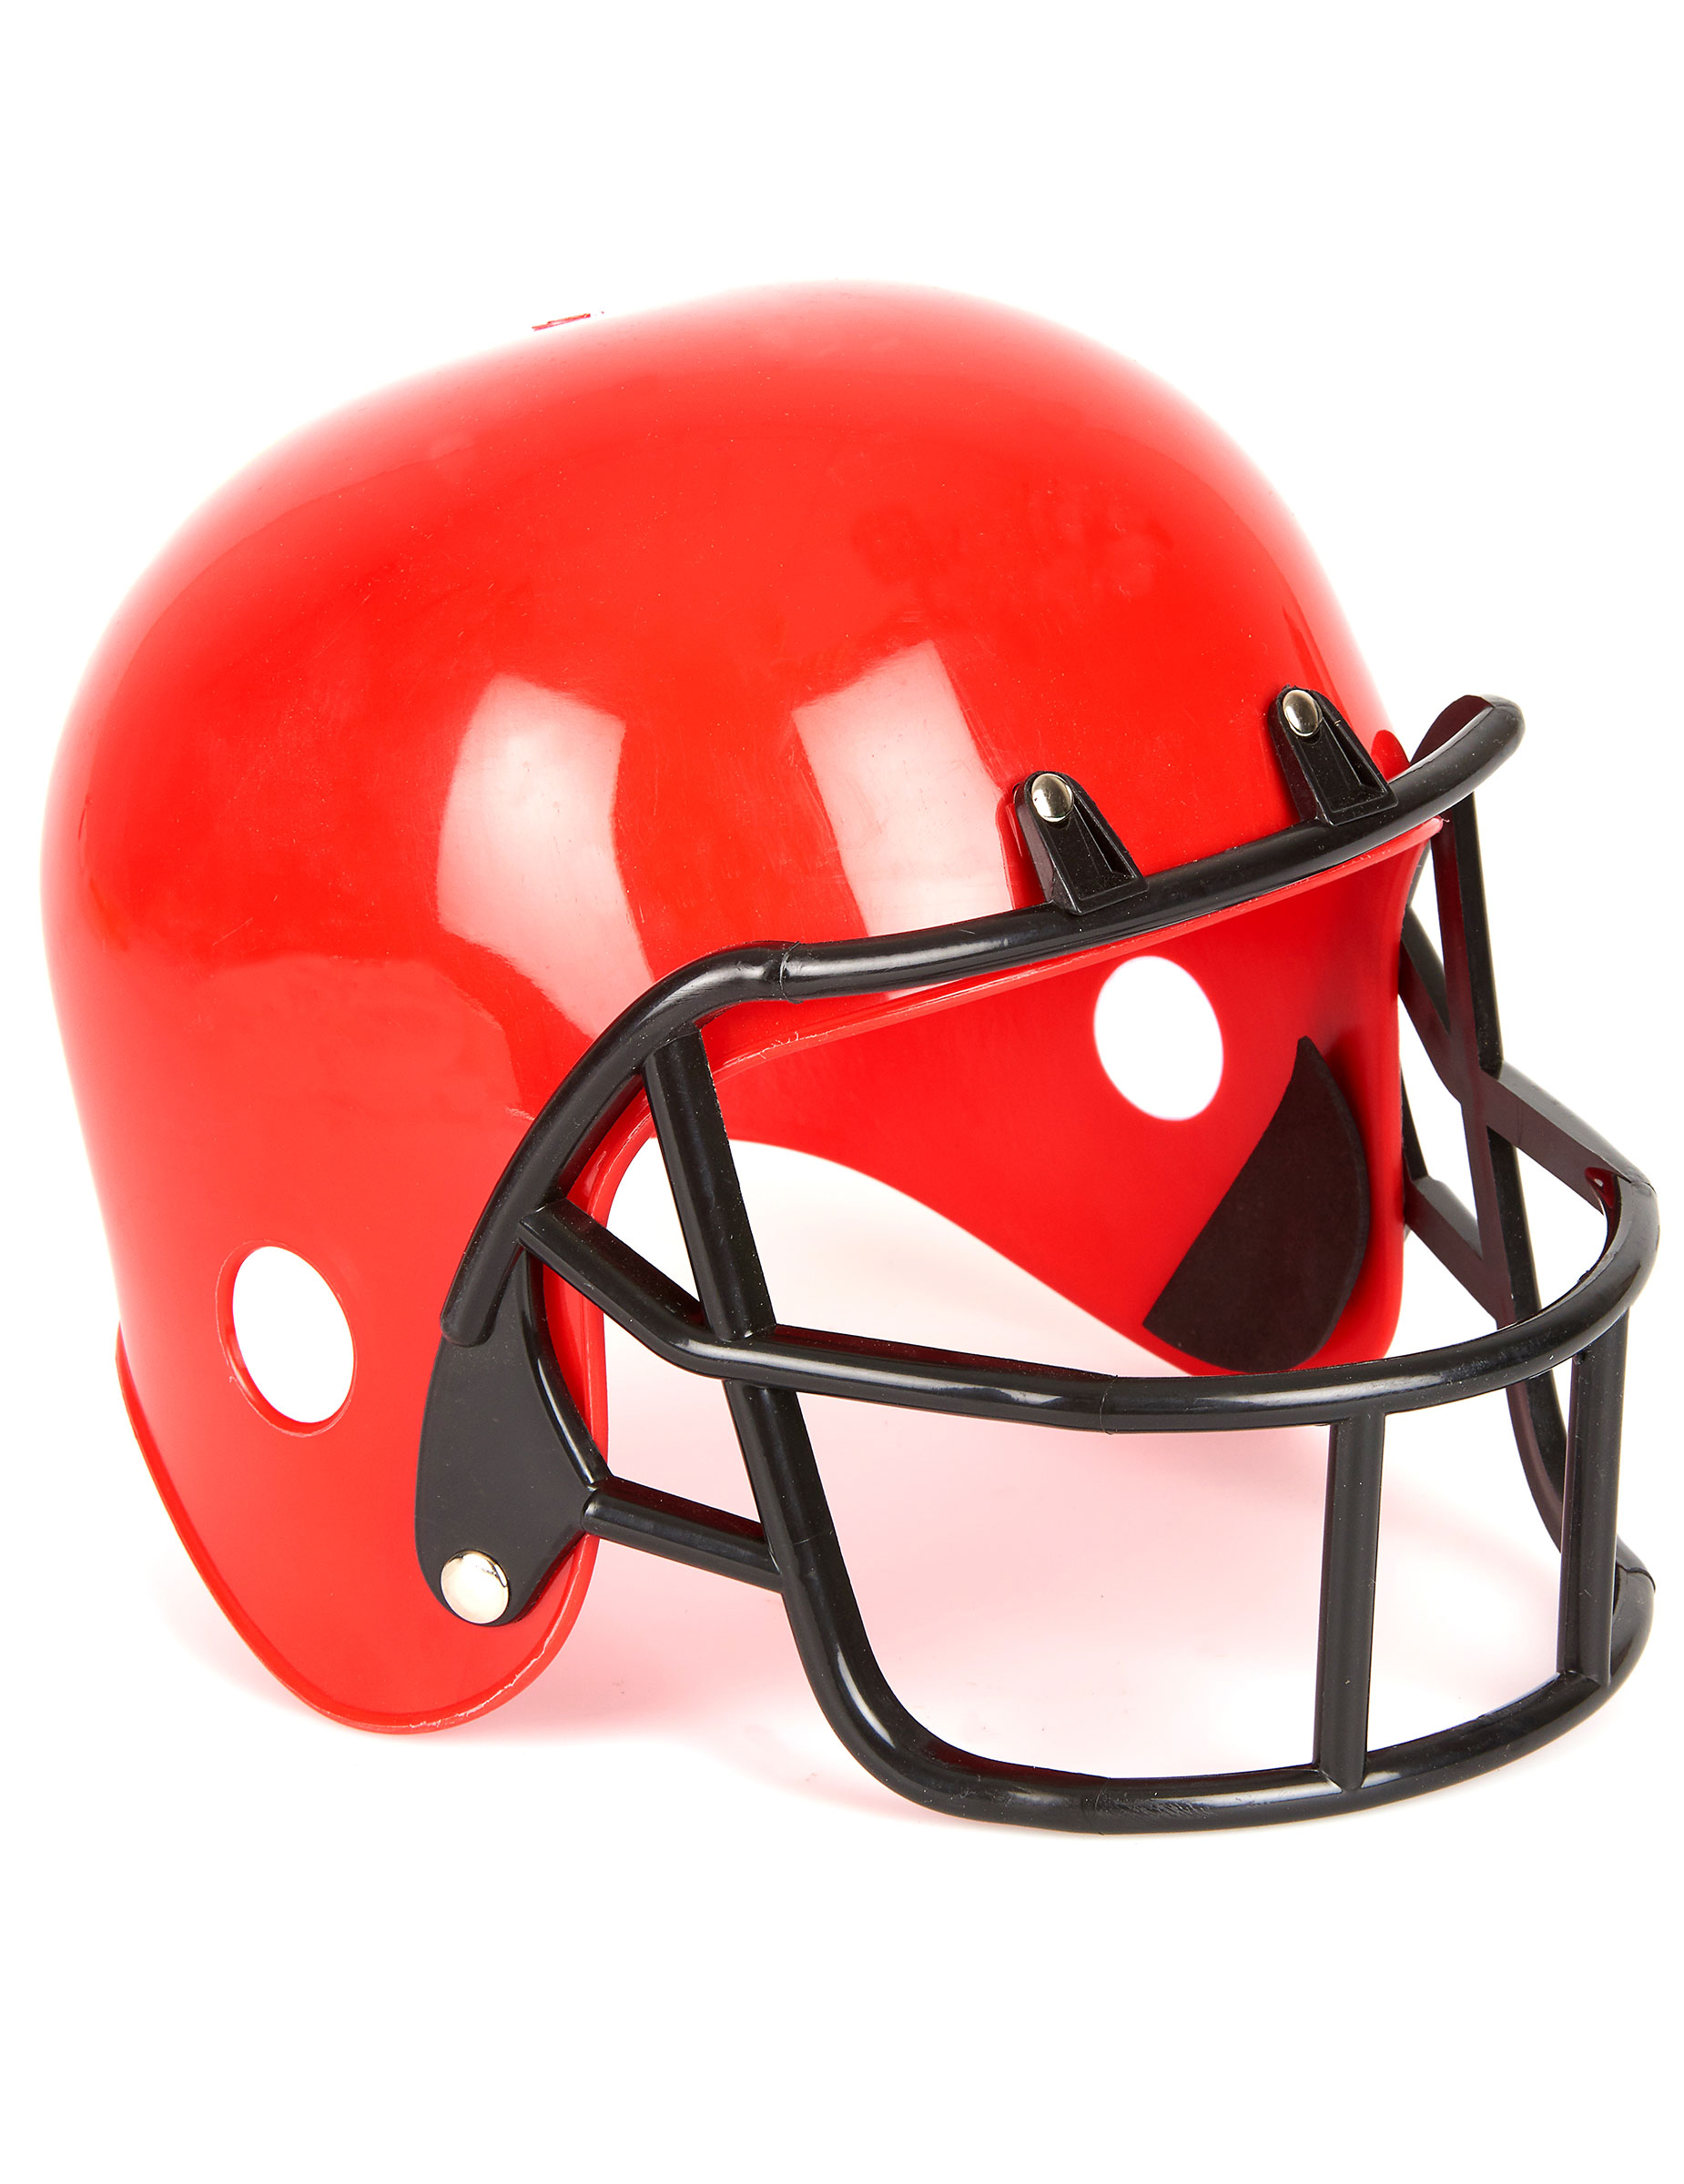 american football helm in rot f r kinder h te und. Black Bedroom Furniture Sets. Home Design Ideas